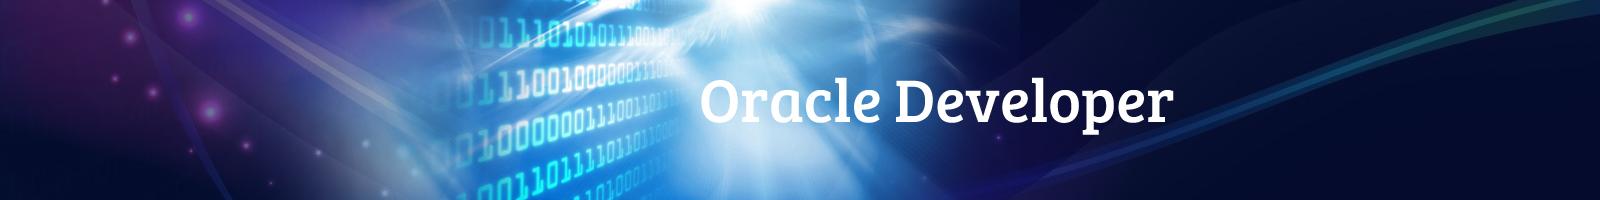 Oracle-Developer